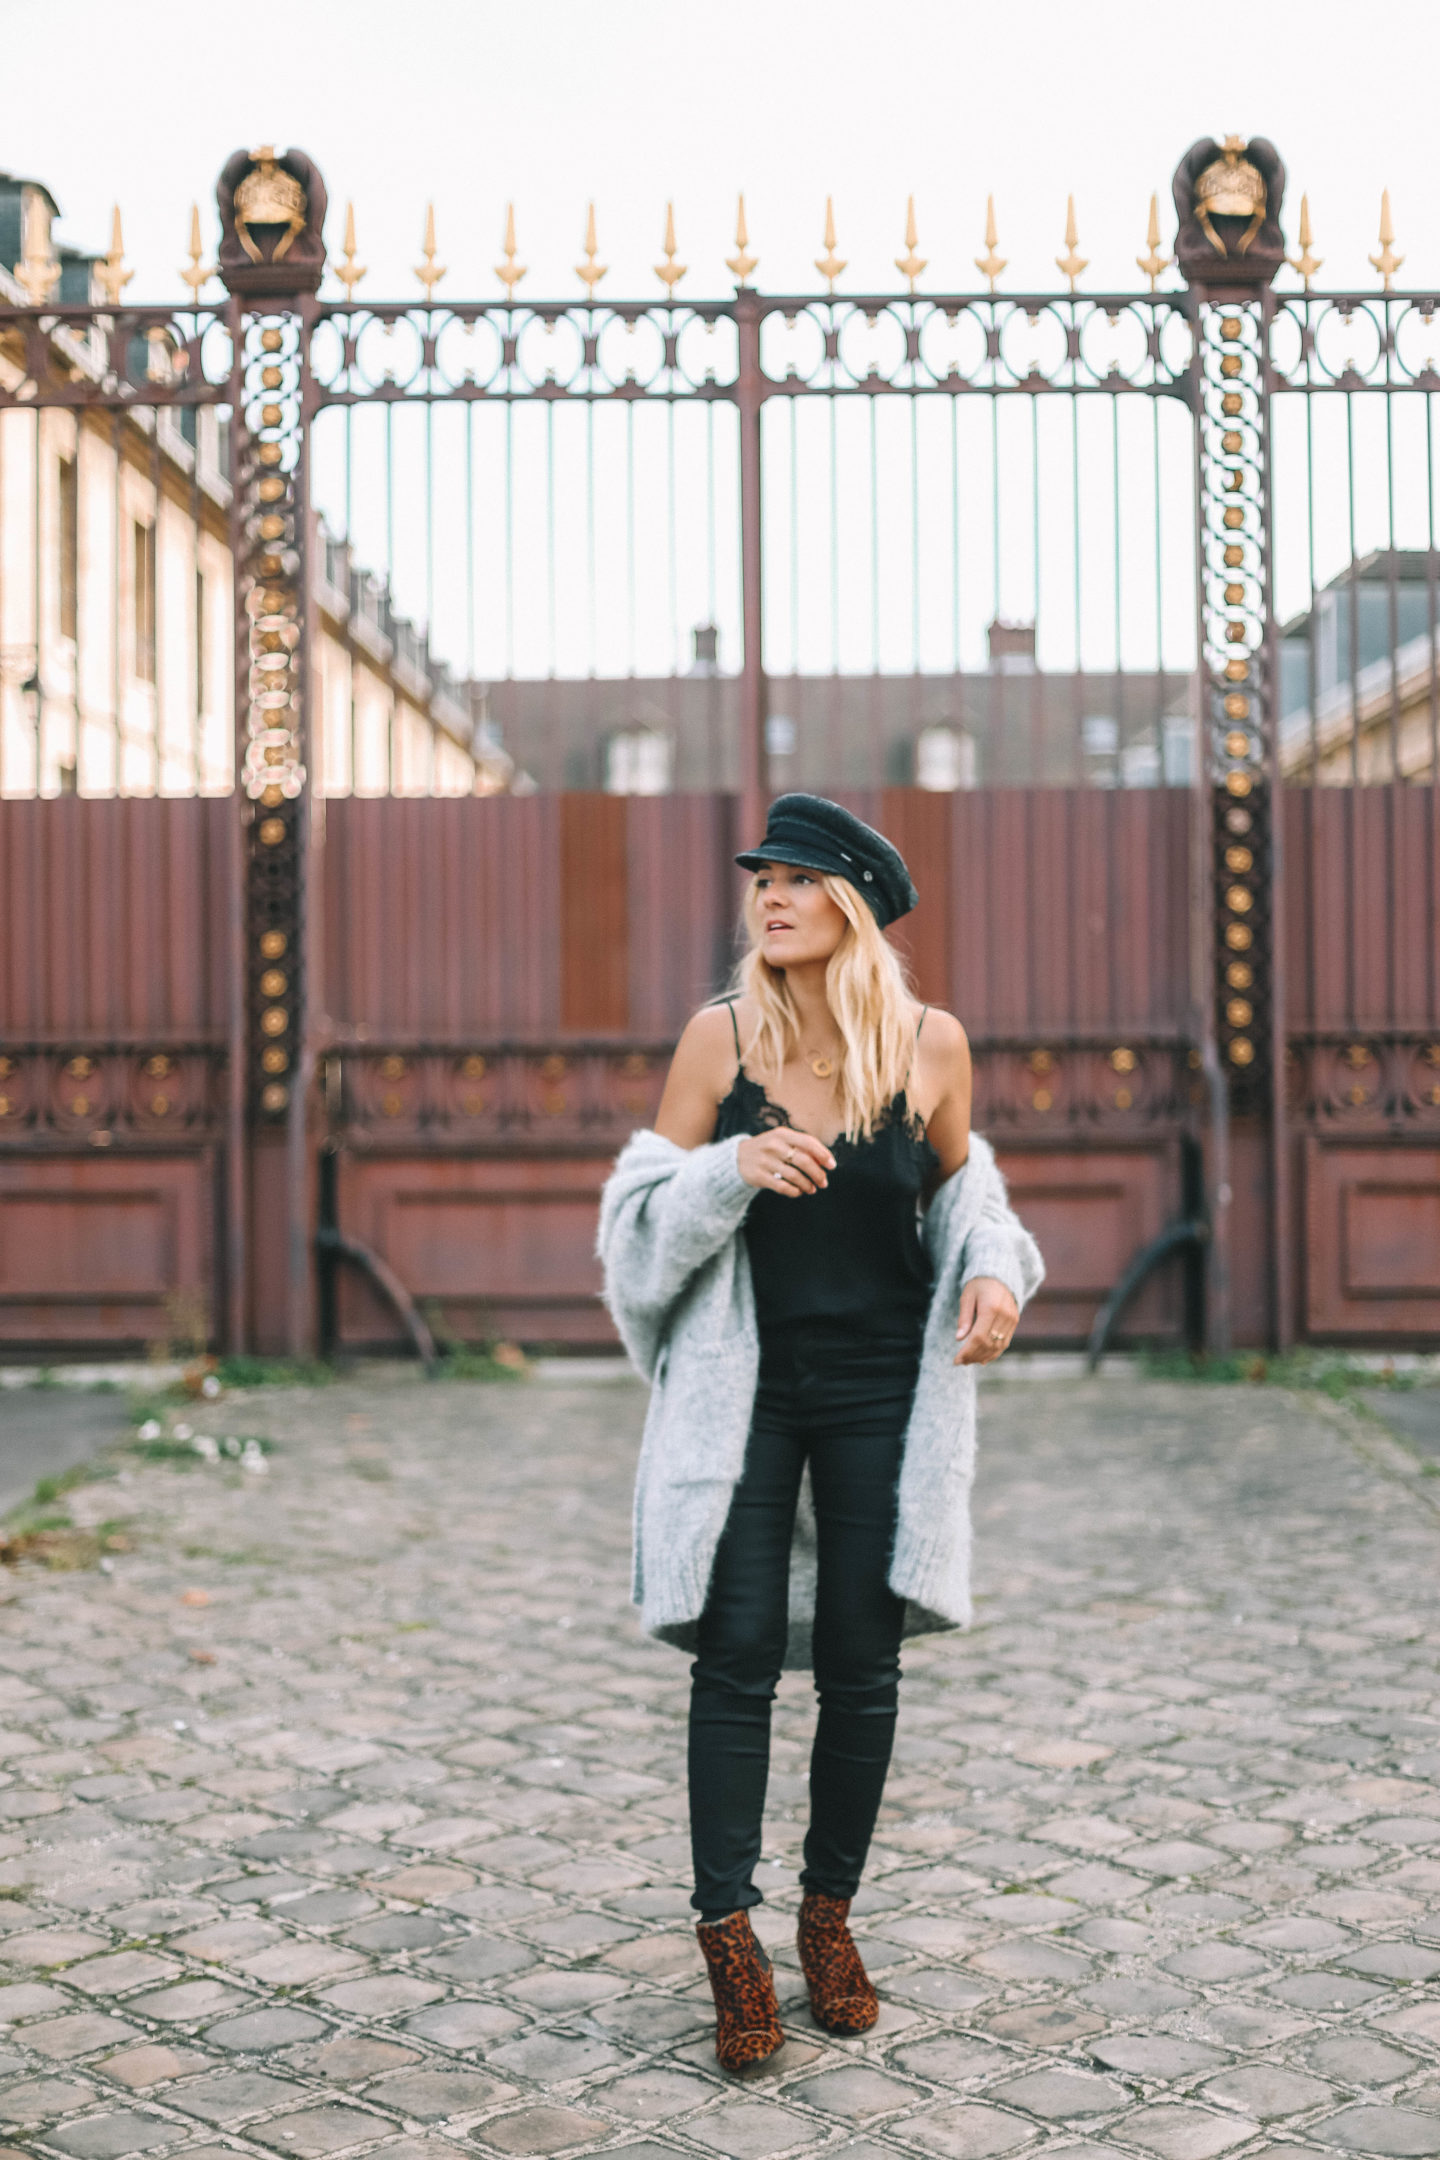 Lidl Mode by Heidi Klum- Blondie baby blog mode et voyages